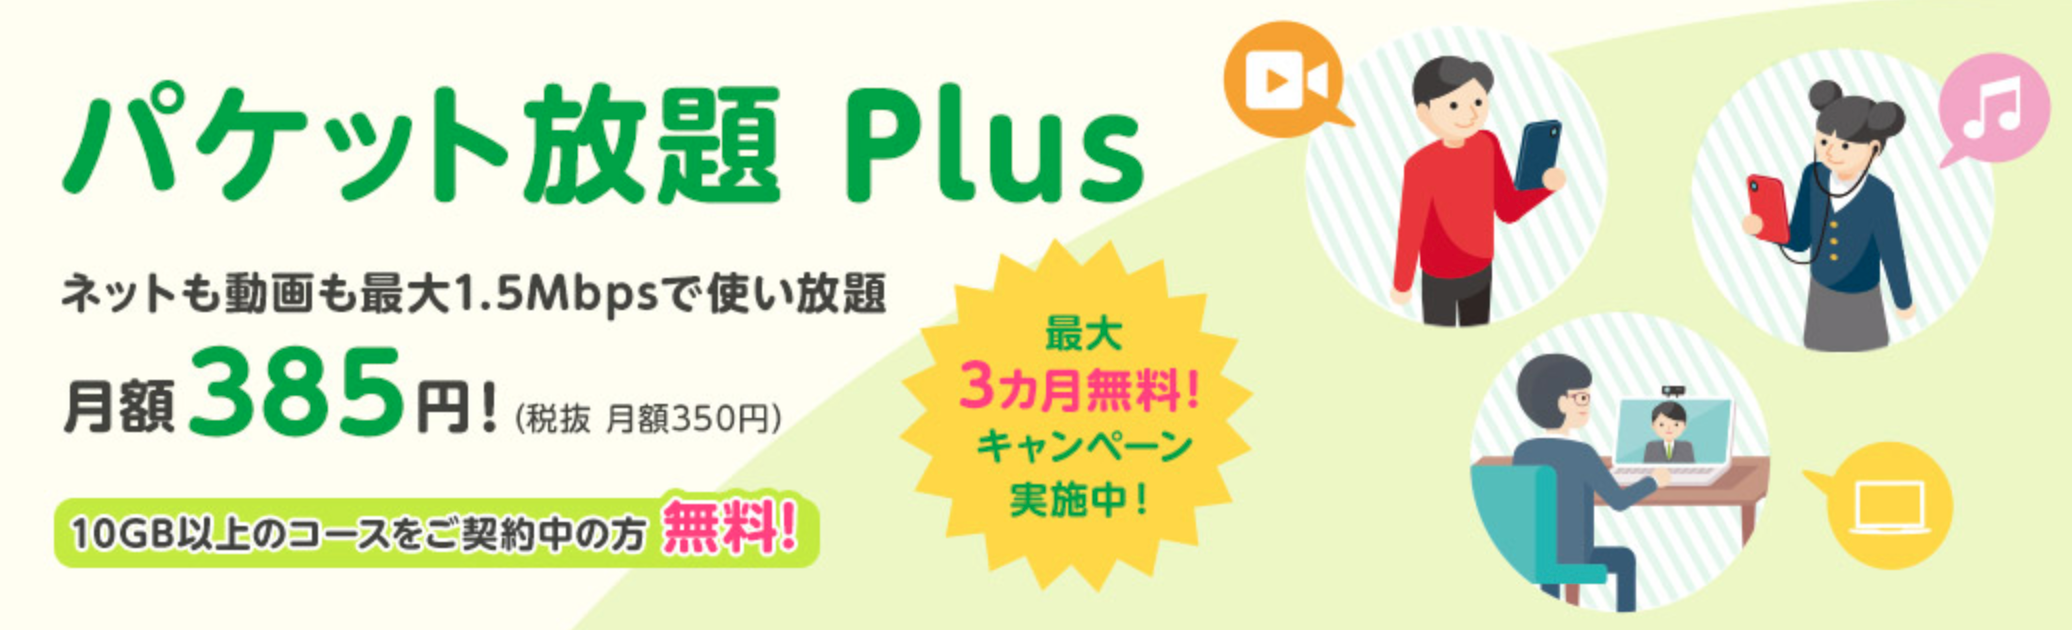 mineo_マイネオ_評判_口コミ_キャンペーン_パケット放題 Plus(1.5Mbps)最大3カ月無料キャンペーン